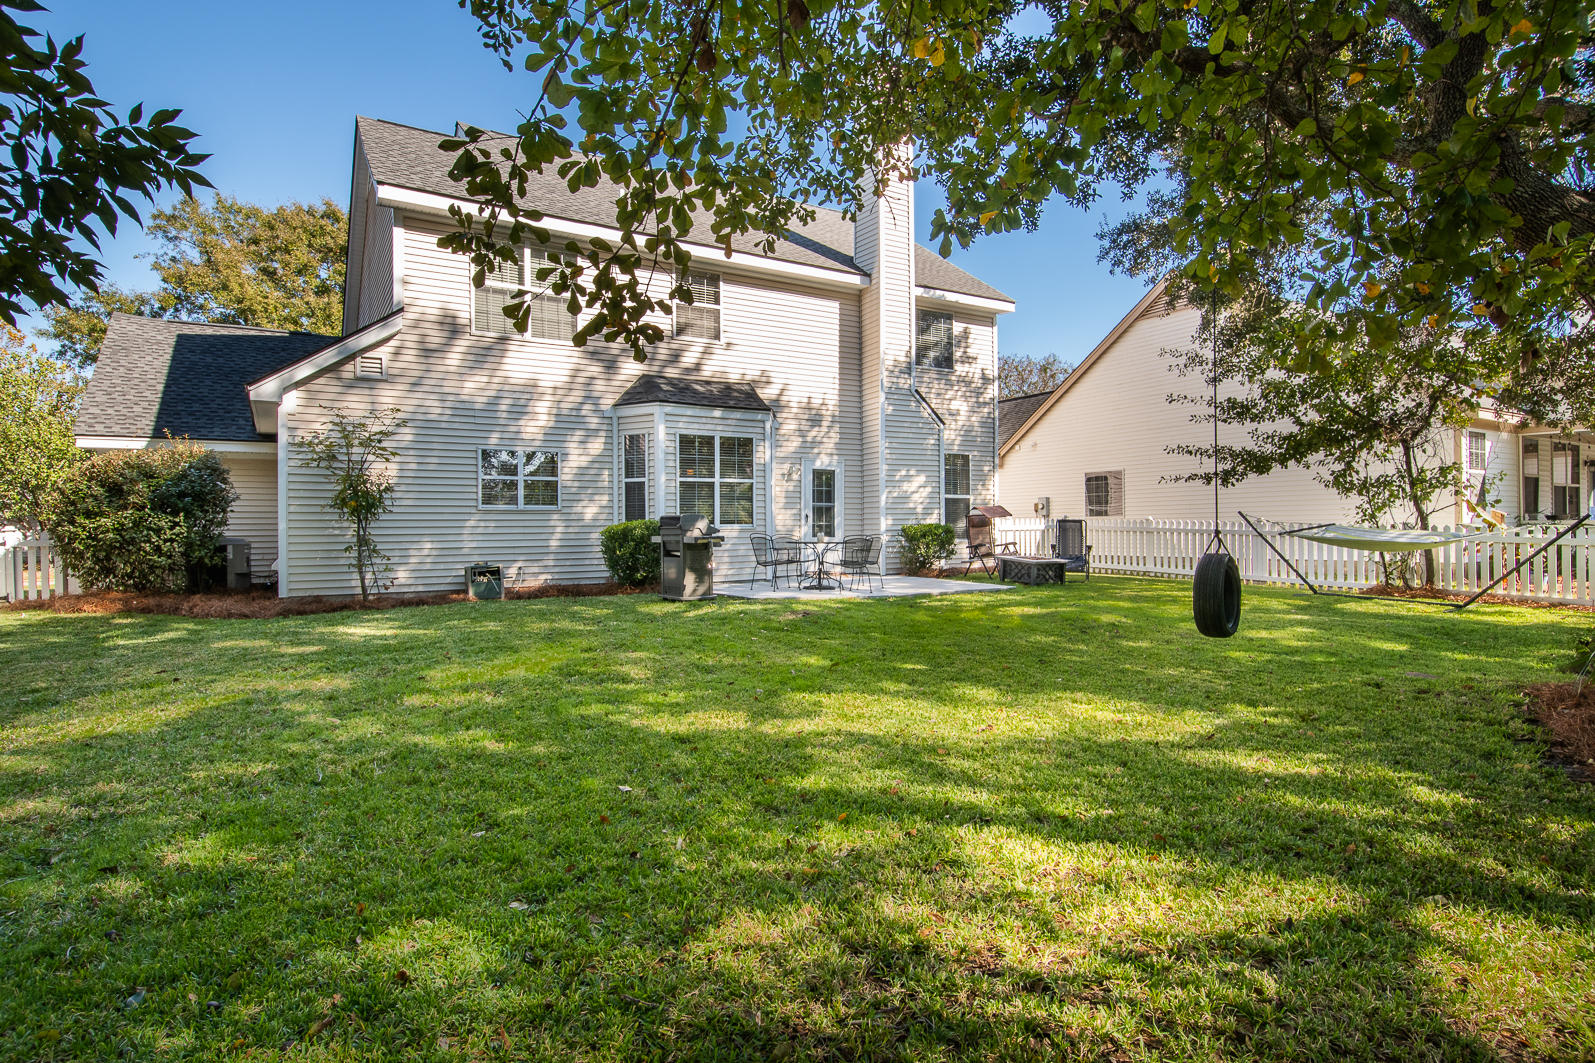 Belle Hall Homes For Sale - 407 Jardinere, Mount Pleasant, SC - 6